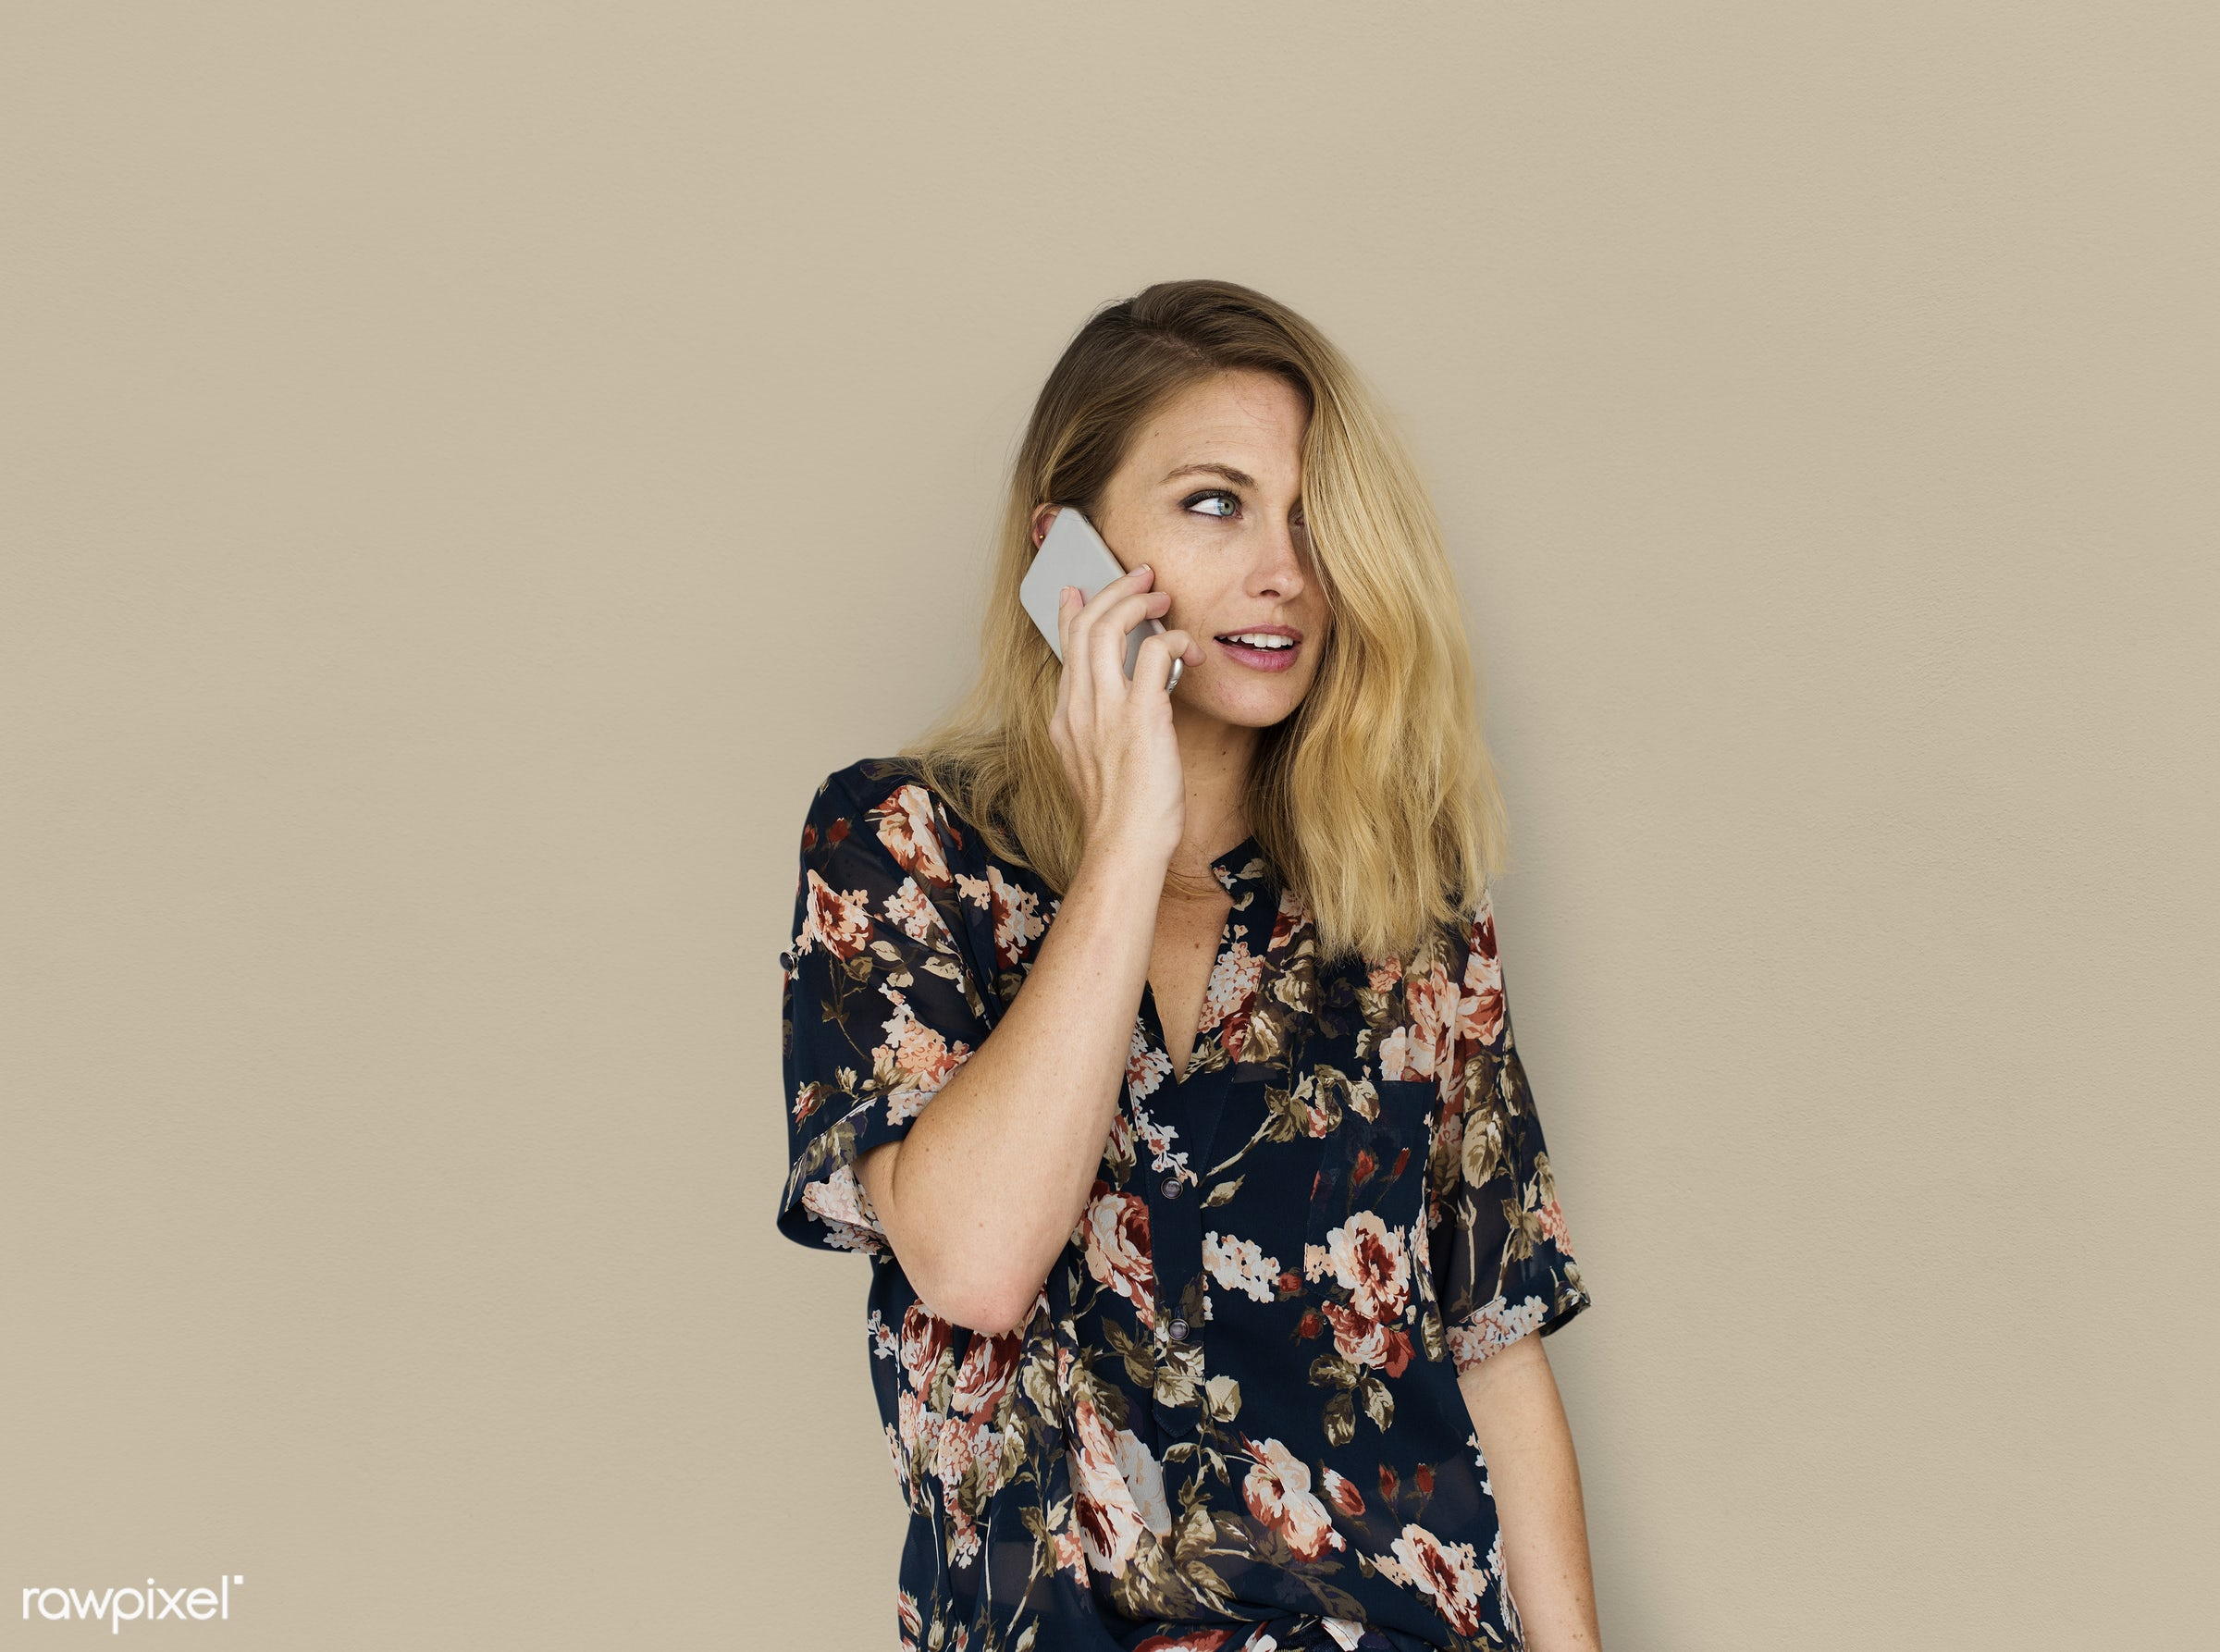 background, beauty, brunette, casual, caucasian, charming, communication, connection, conversation, dealing, discussion,...